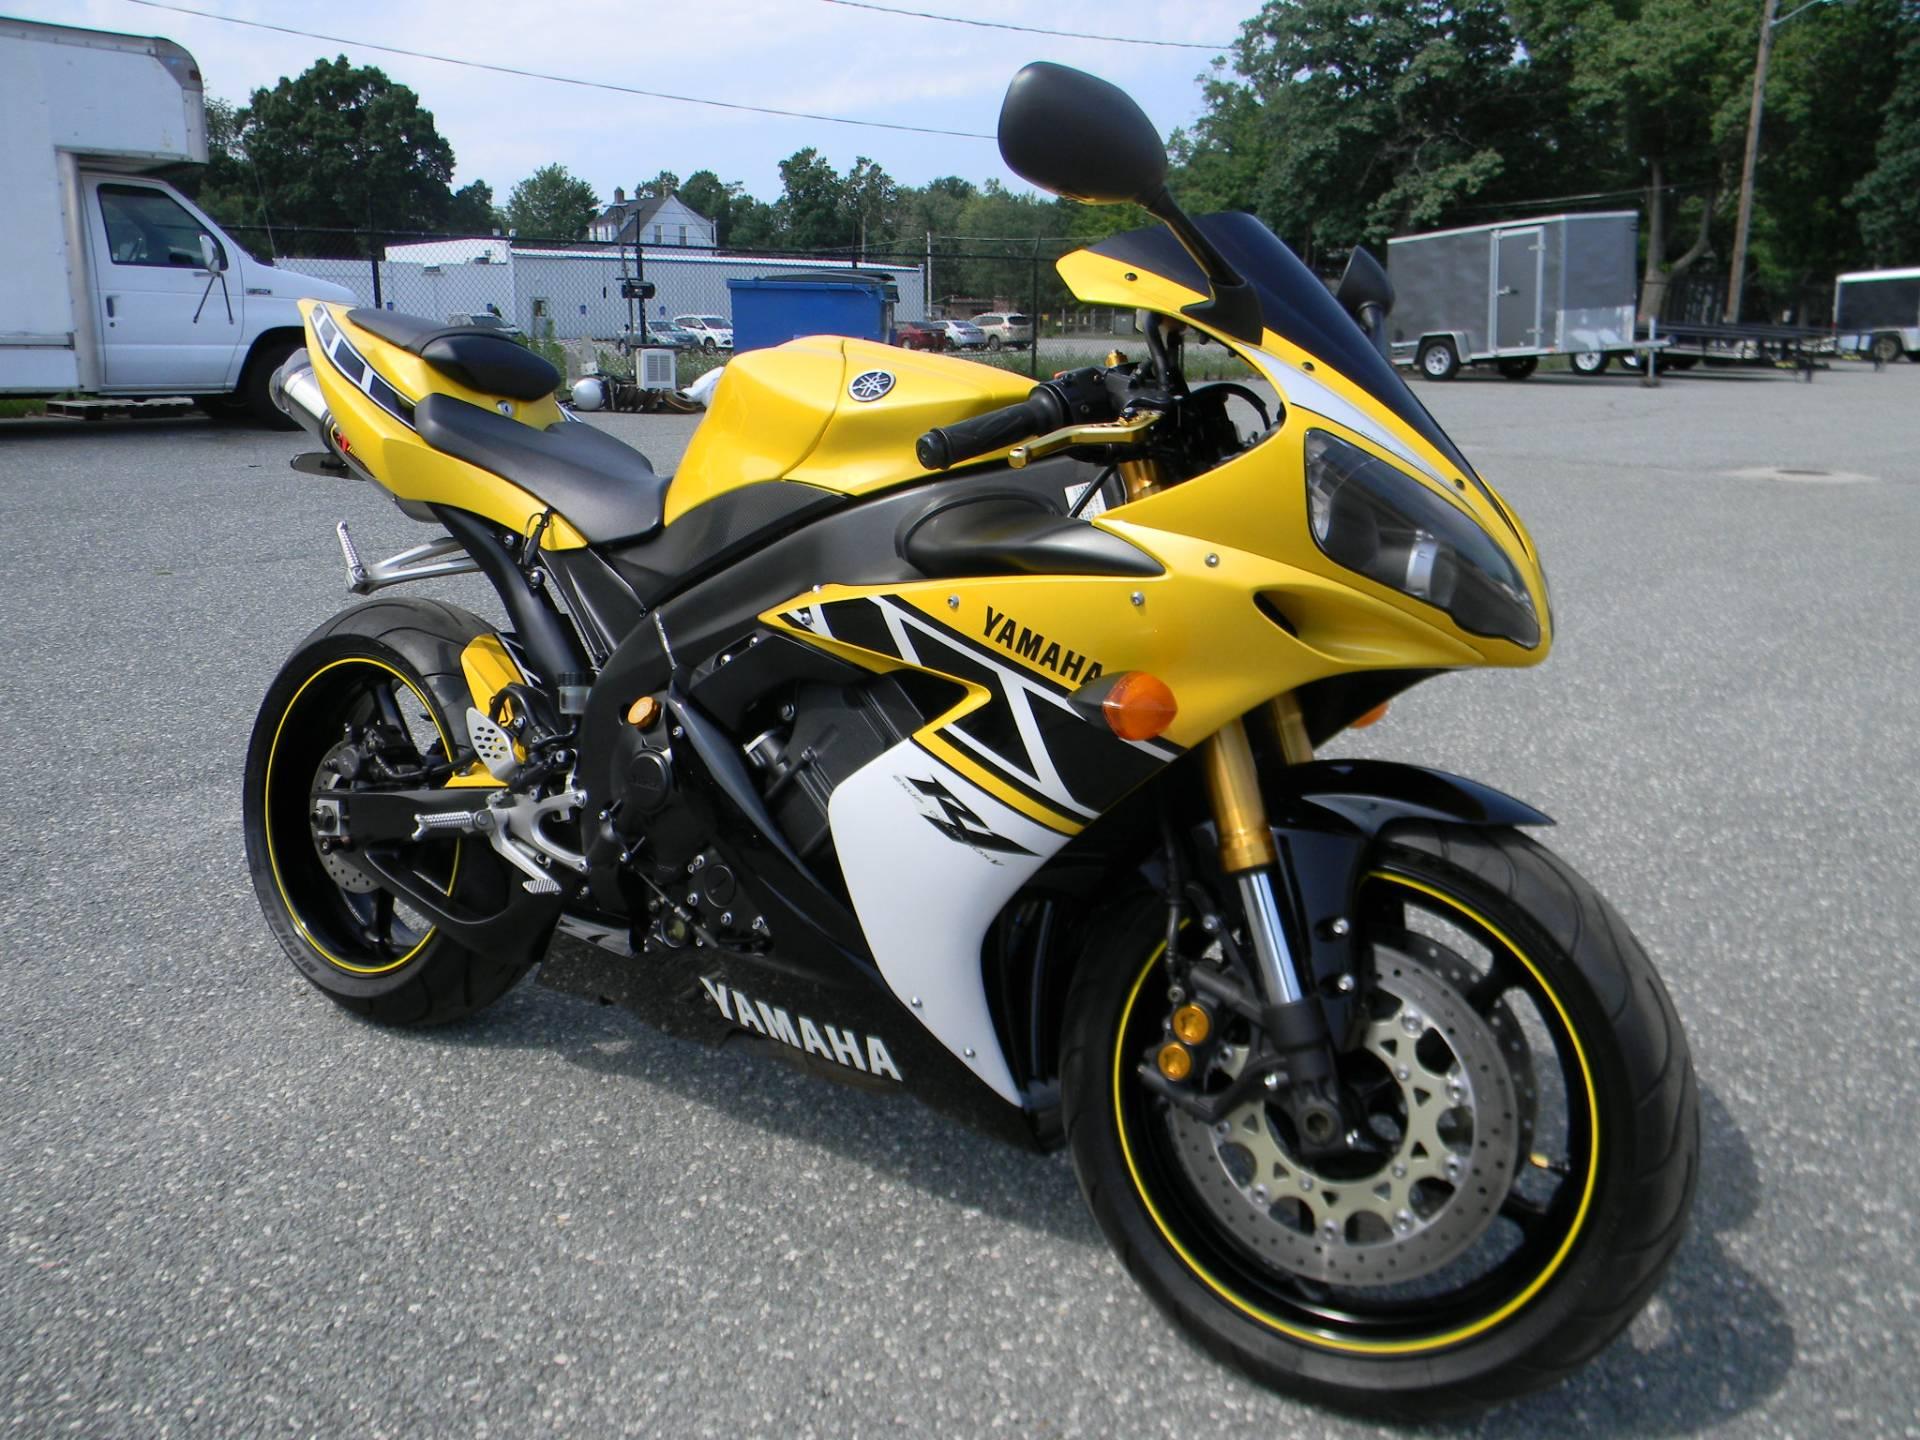 2006 Yamaha YZF-R1 2